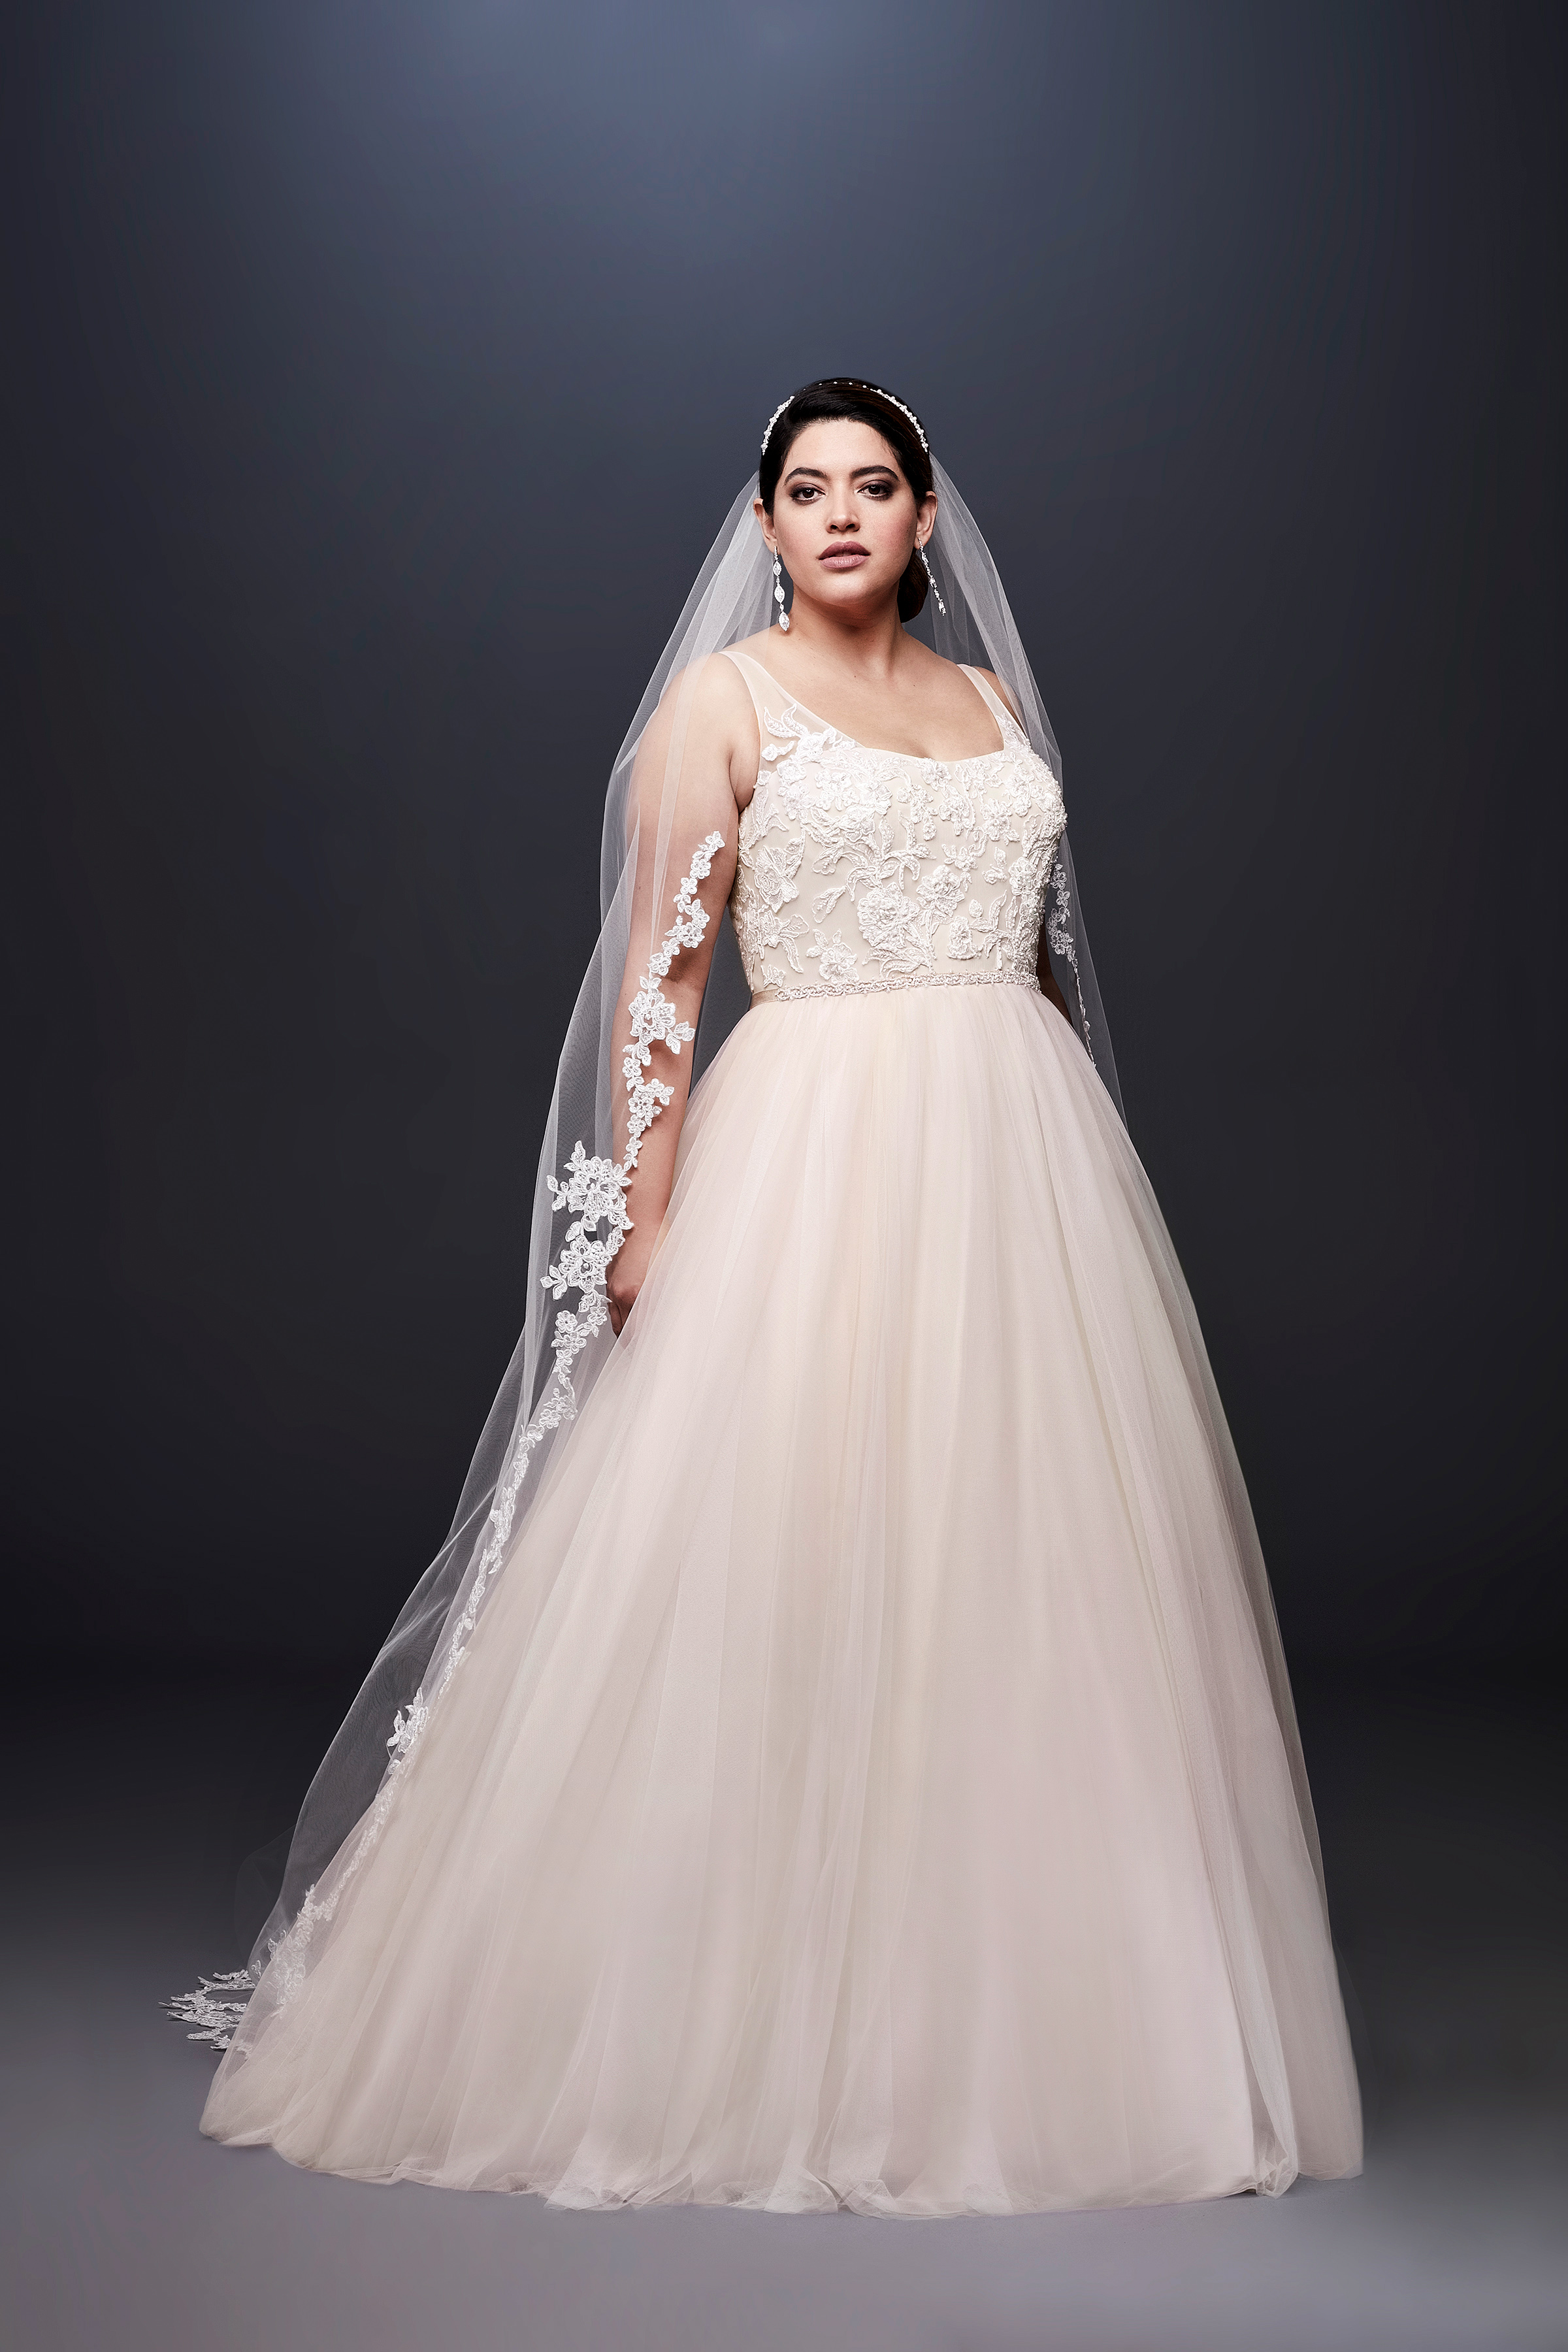 david bridal wedding dress spring 2019 lace a-line sleeveless tulle